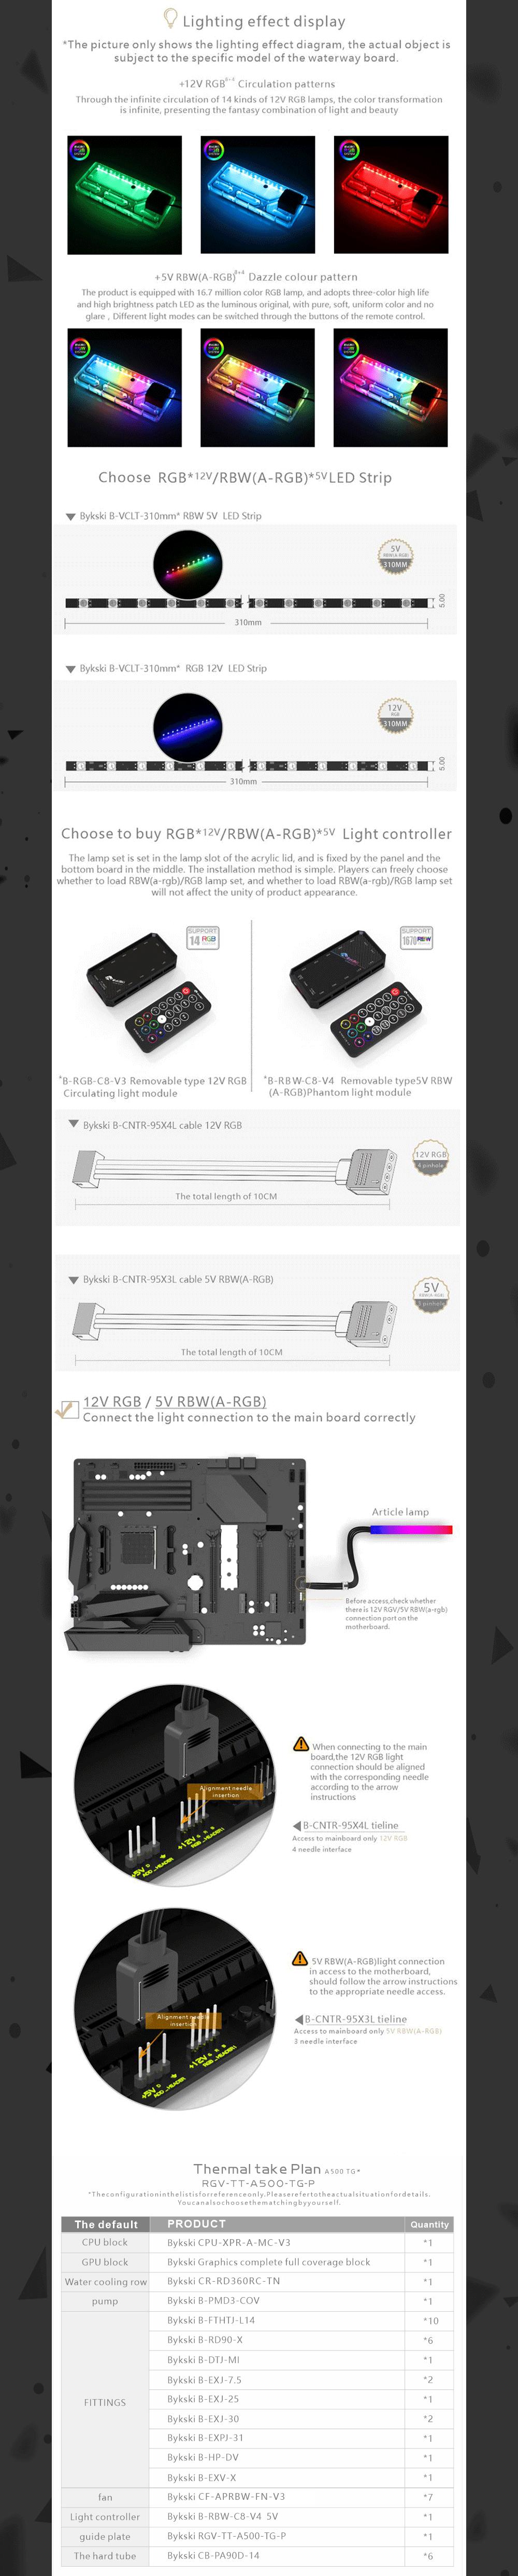 Bykski Waterway Cooling Kit For Tt A500TG Case, 5V ARGB, For Single GPU Building, RGV-TT-A500-TG-P